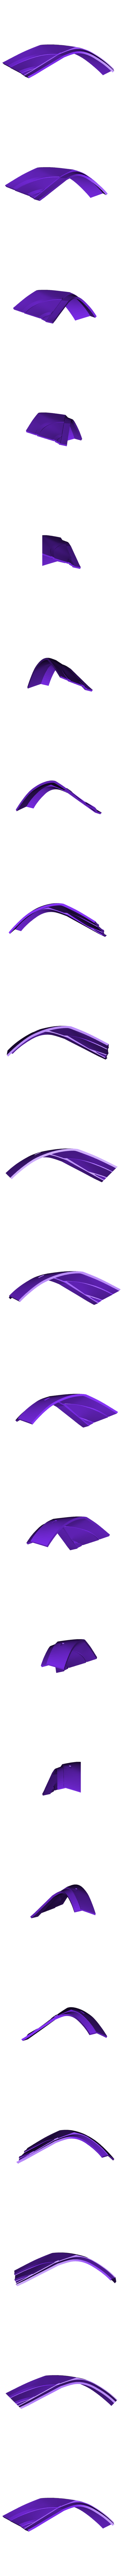 Part_6_v2.stl Download free STL file Battlestar Galactica Colonial Viper Pilot Helmet • 3D printing object, VillainousPropShop